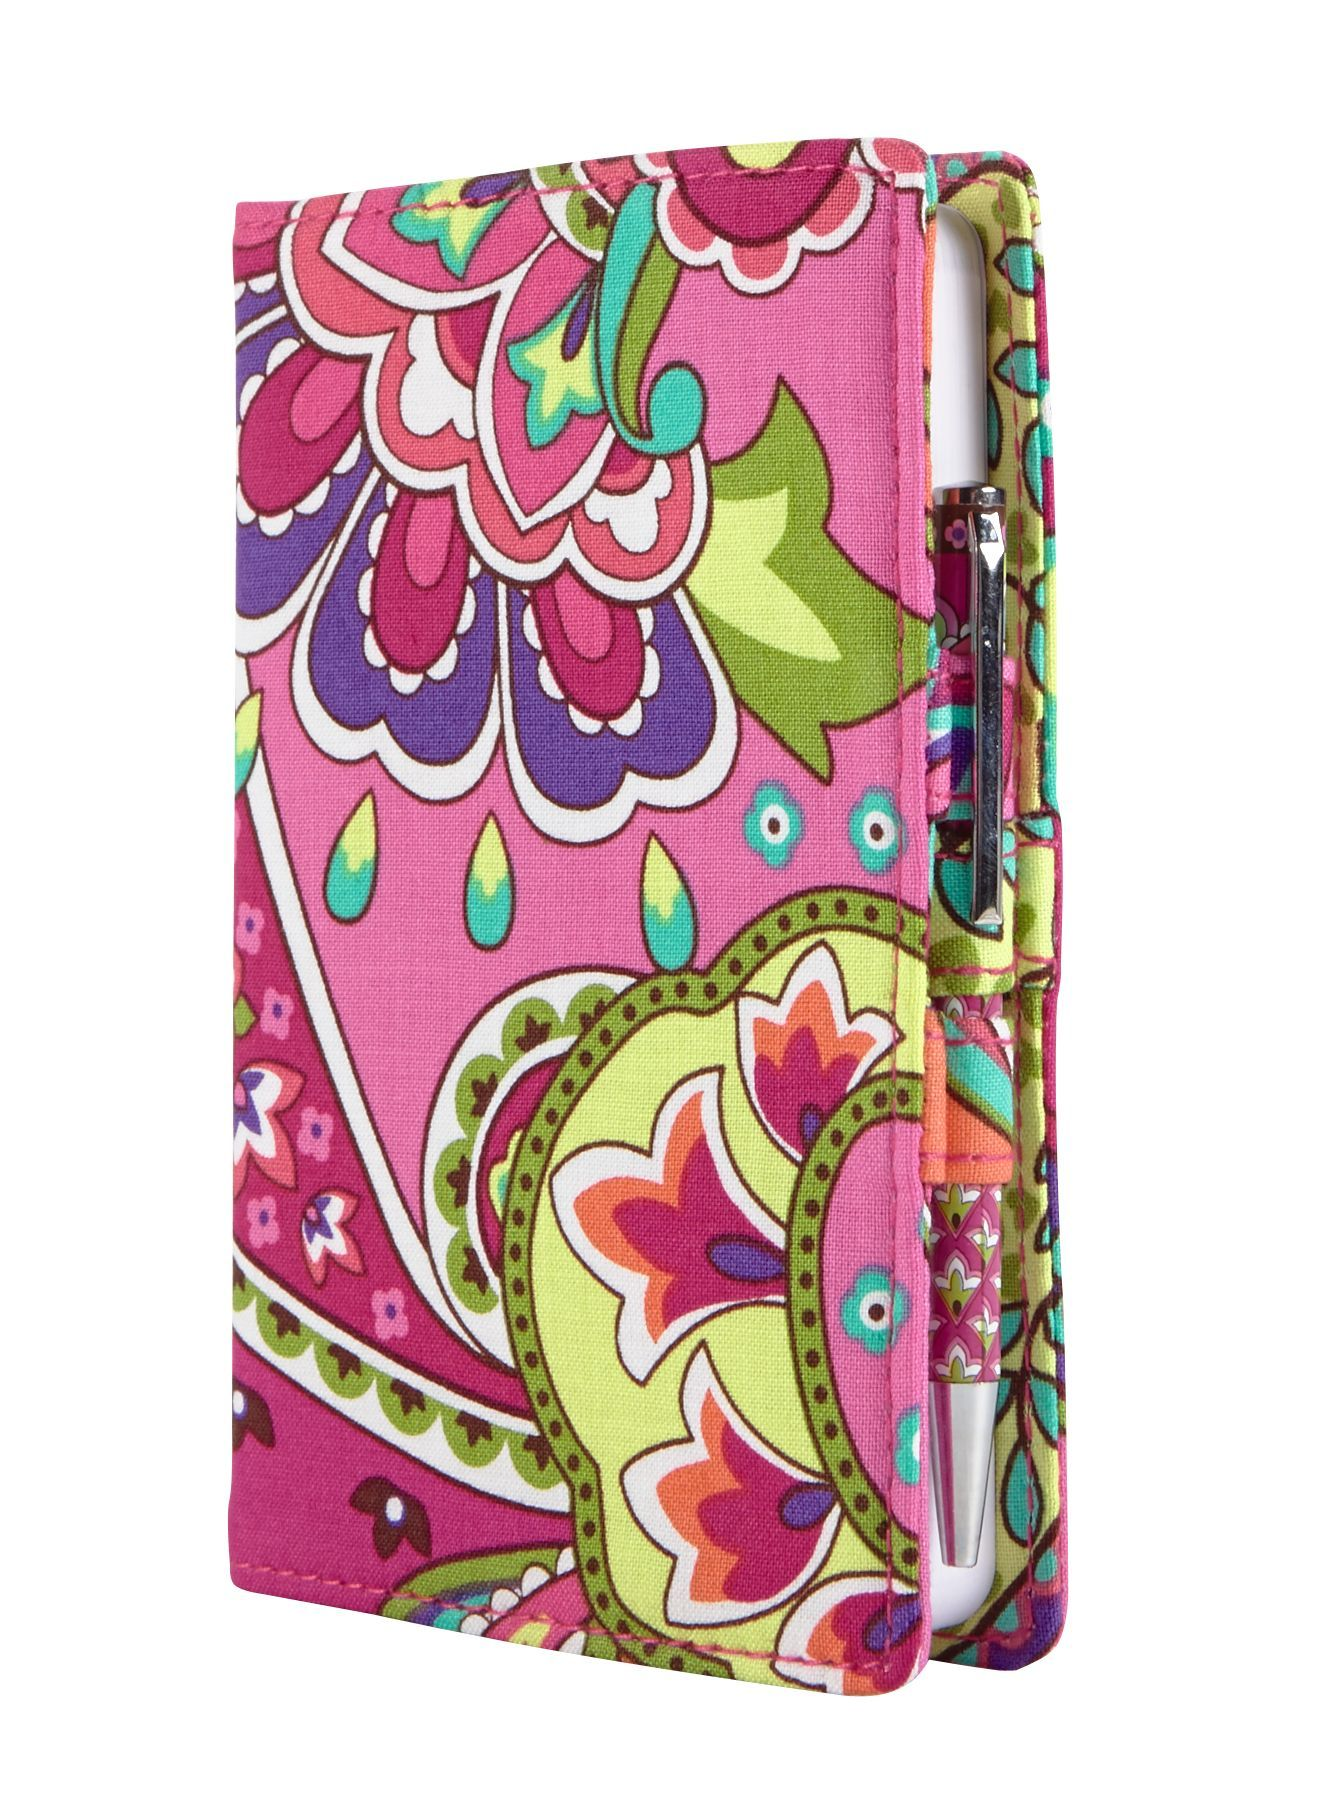 Vera Bradley fabric journal - Pink Swirls  f5bdc9928cf33